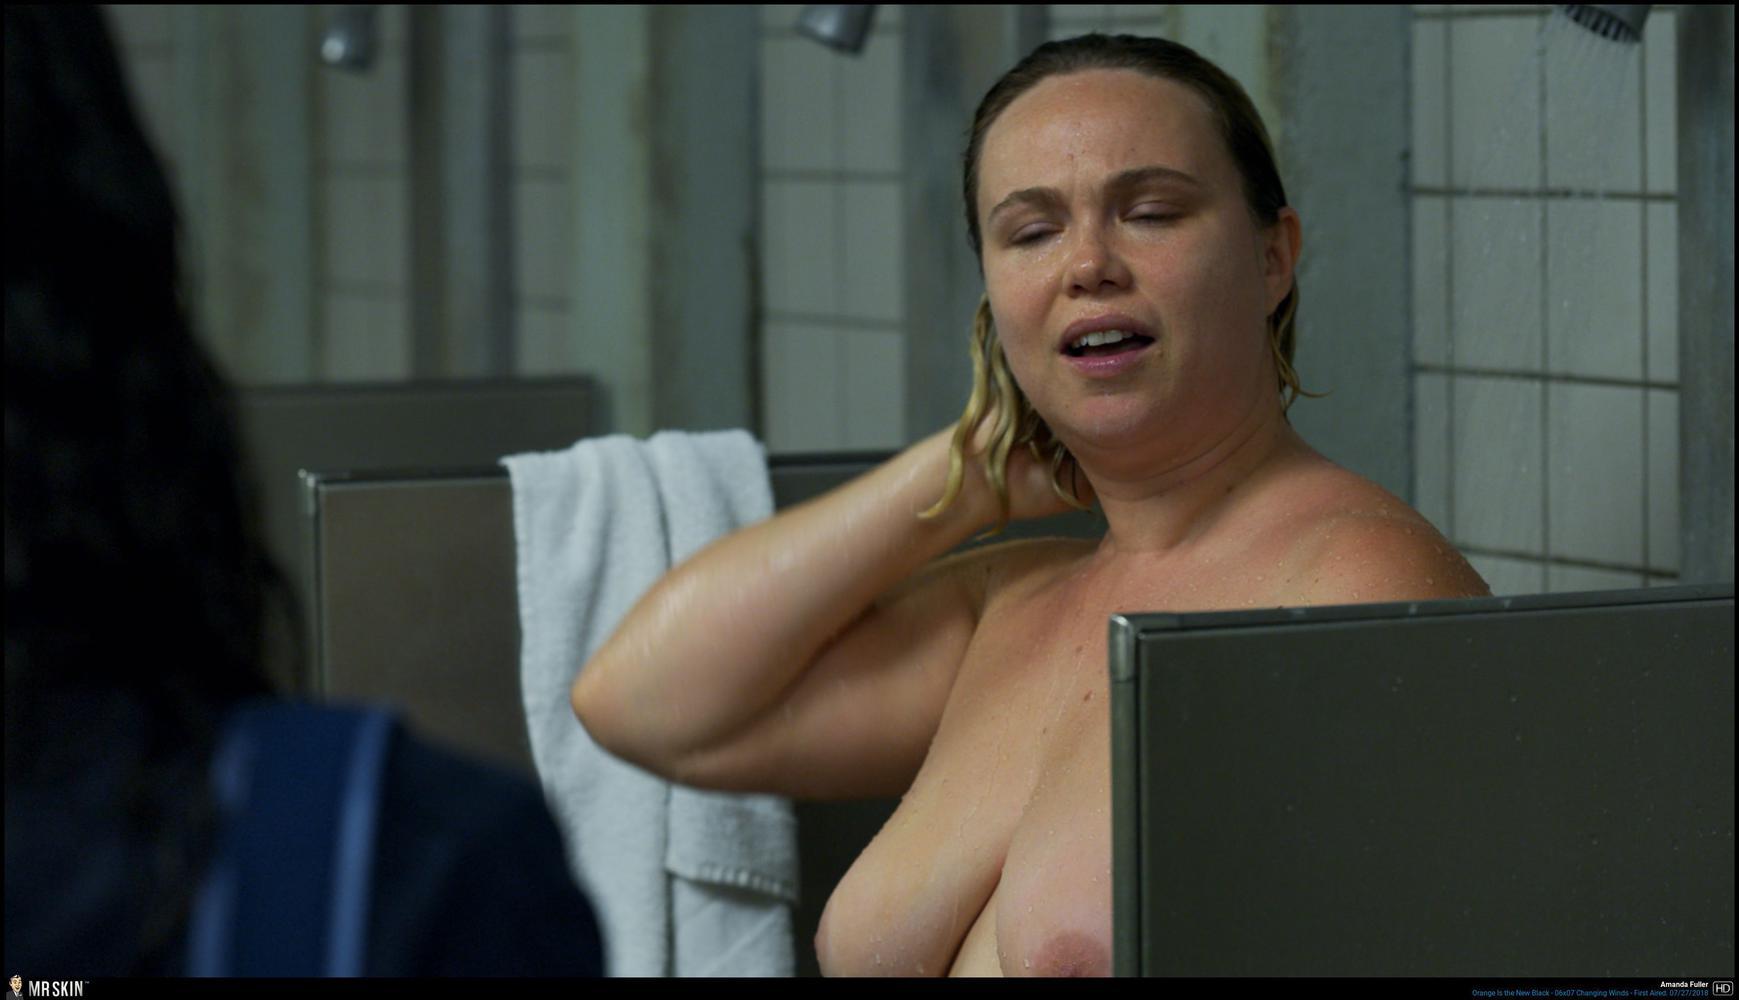 orange is the new black season 6 nudity